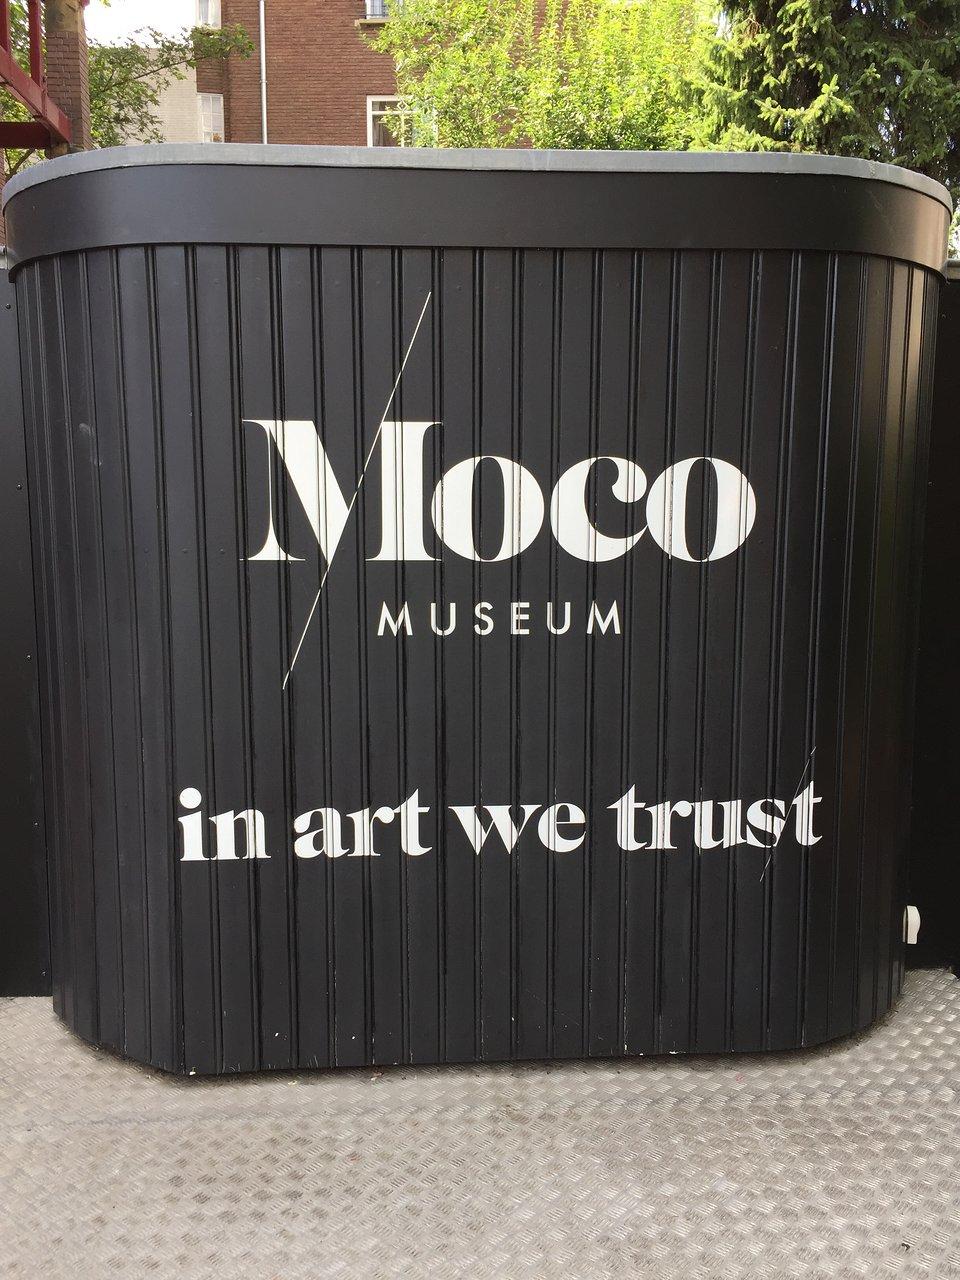 Moco Museum - Amsterdam - Moco Museum Yorumları - Tripadvisor pour Salon De Jardin Casino